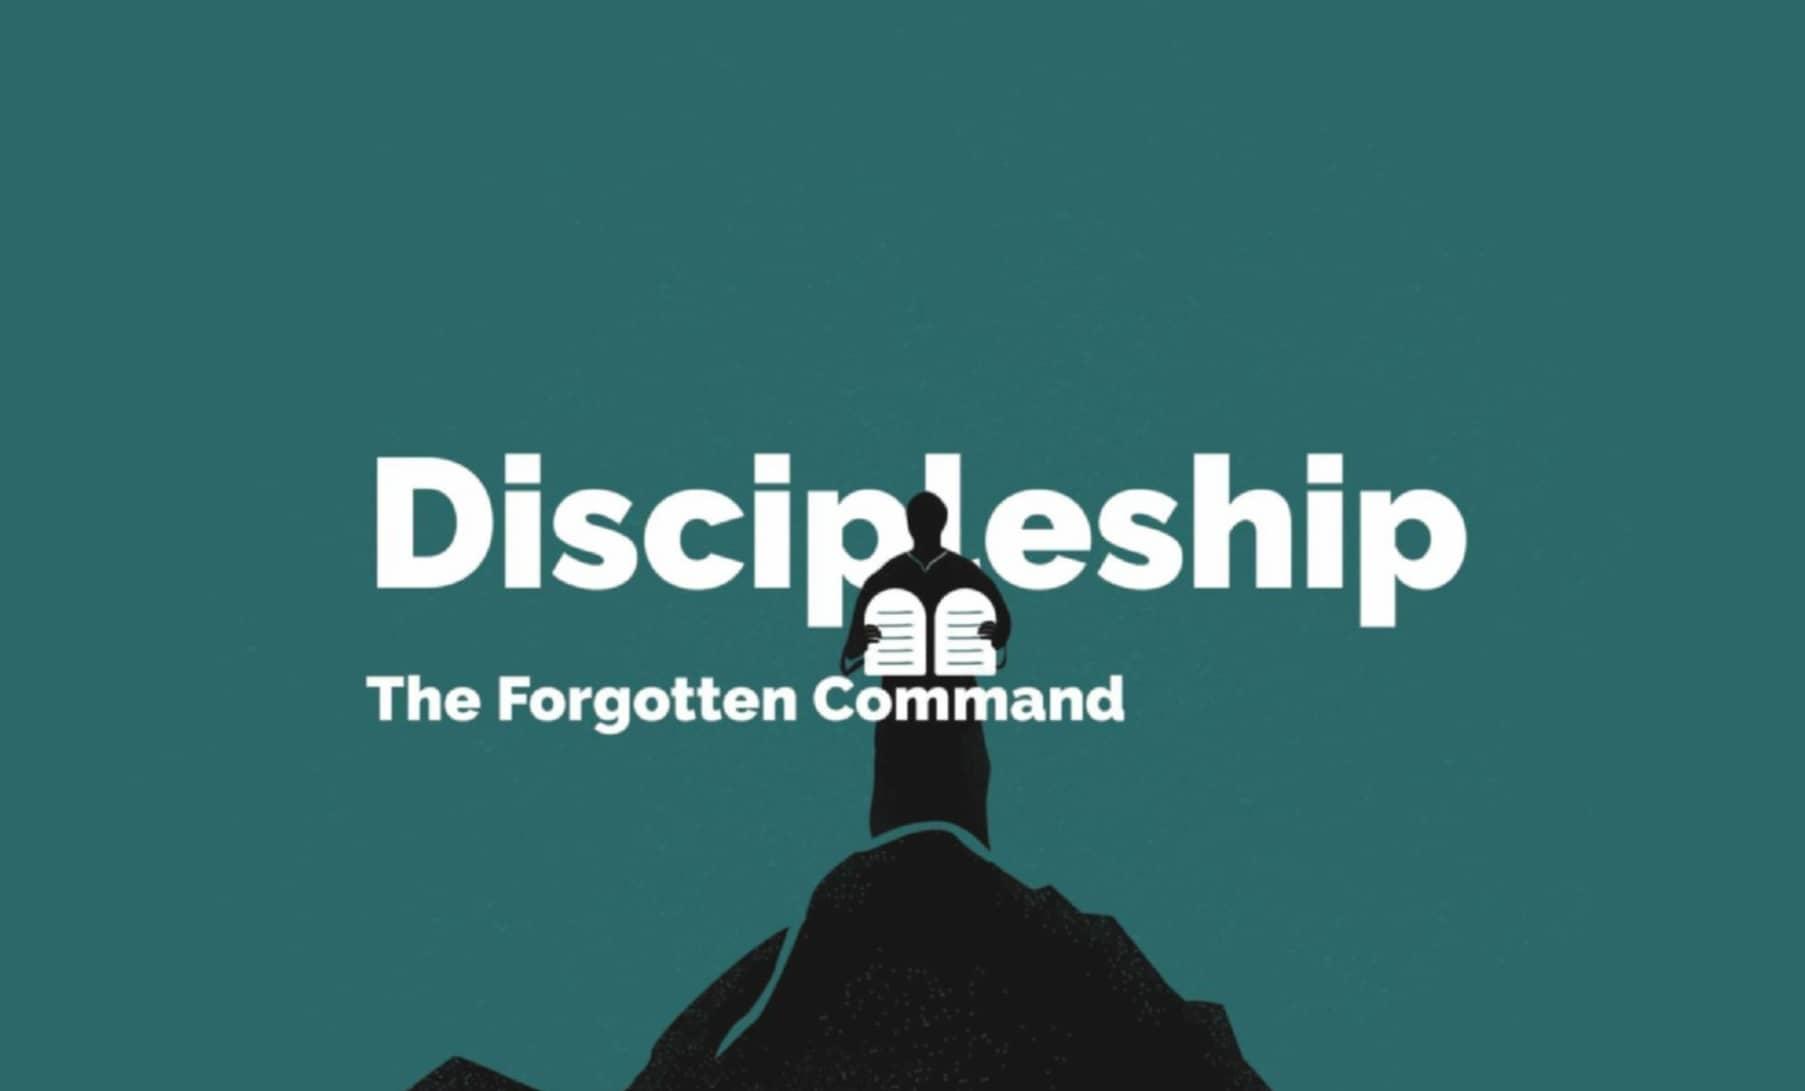 Discipleship - The Forgotten Command